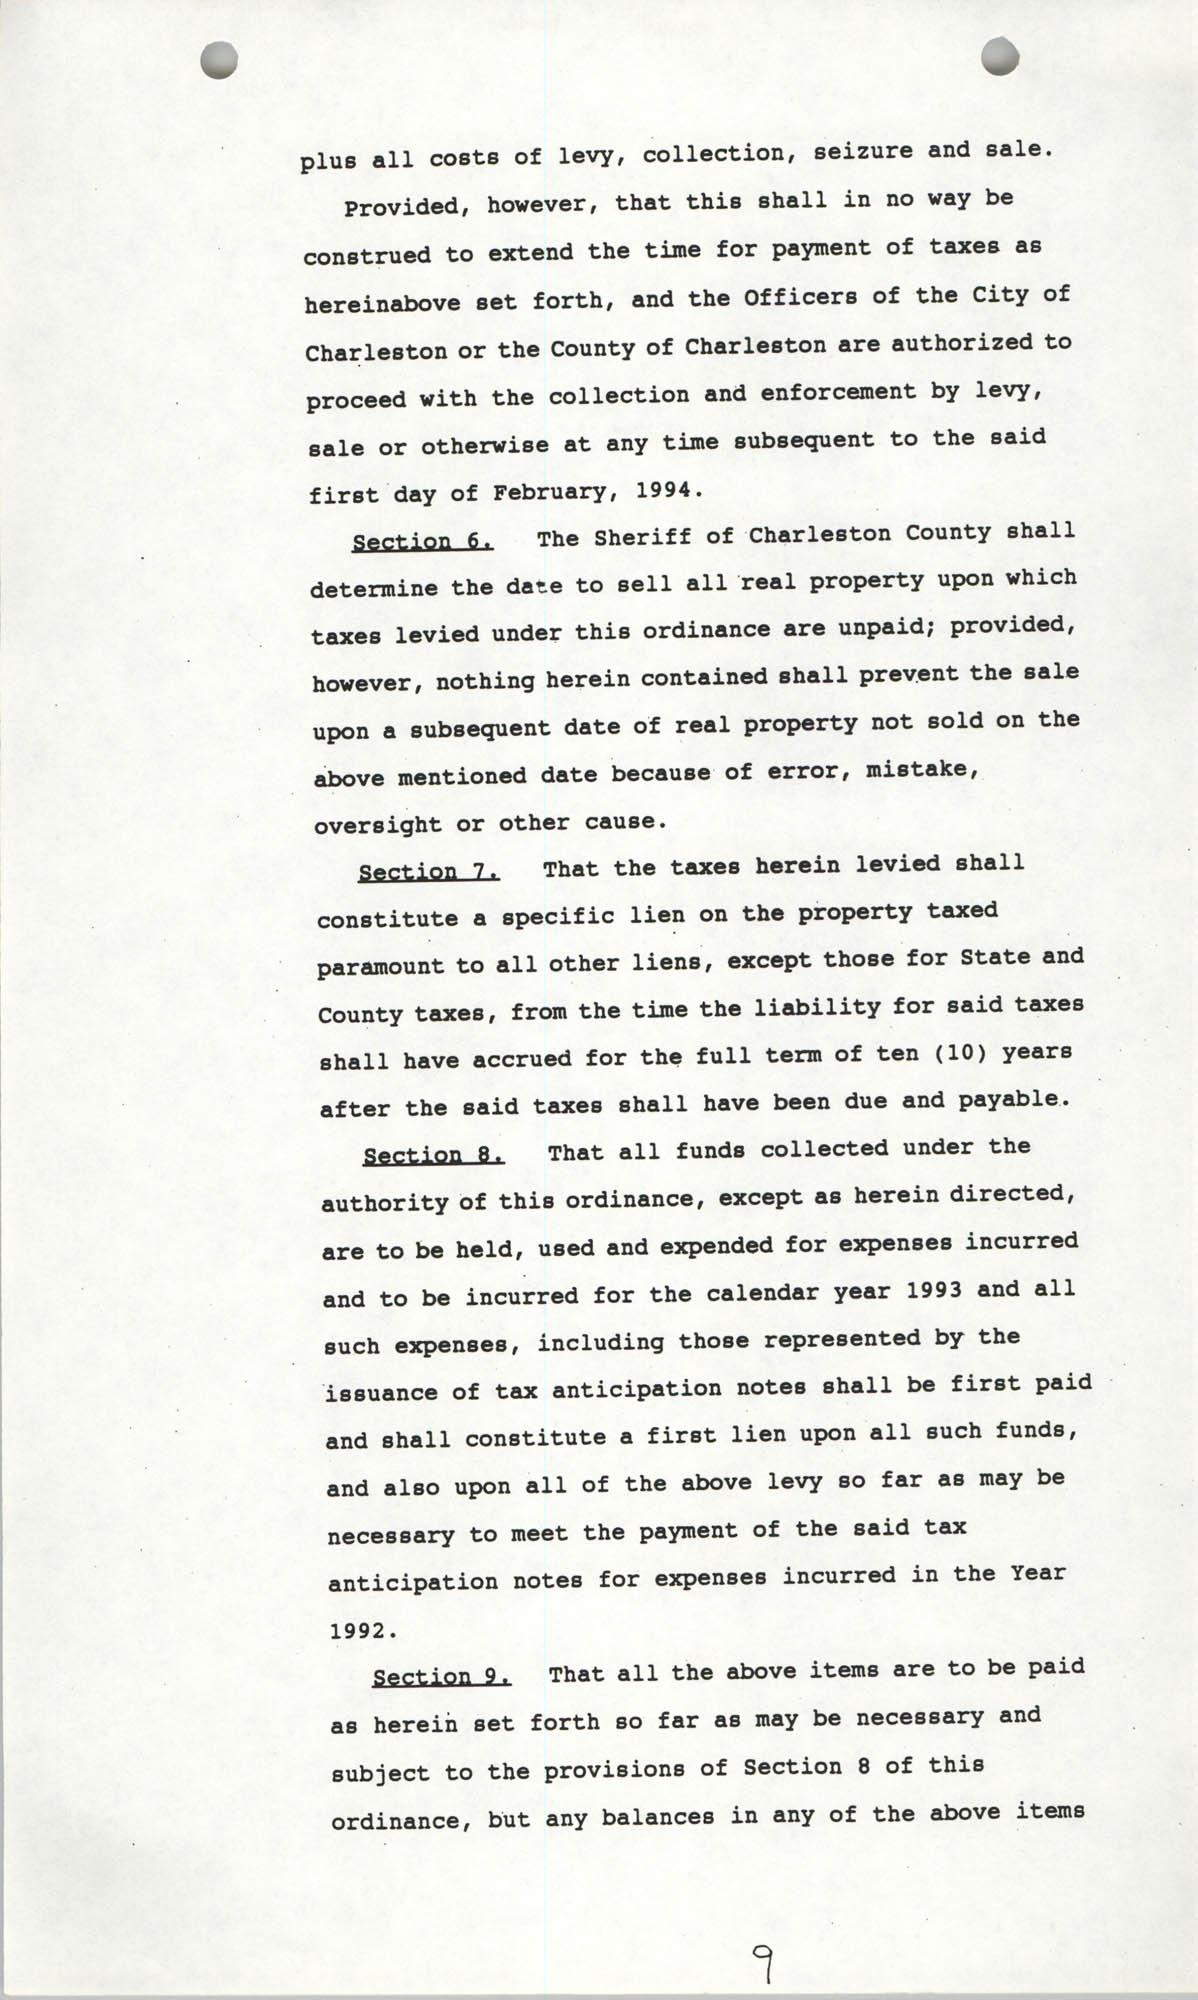 The City Council of Charleston, South Carolina, 1993 Budget, Page 9